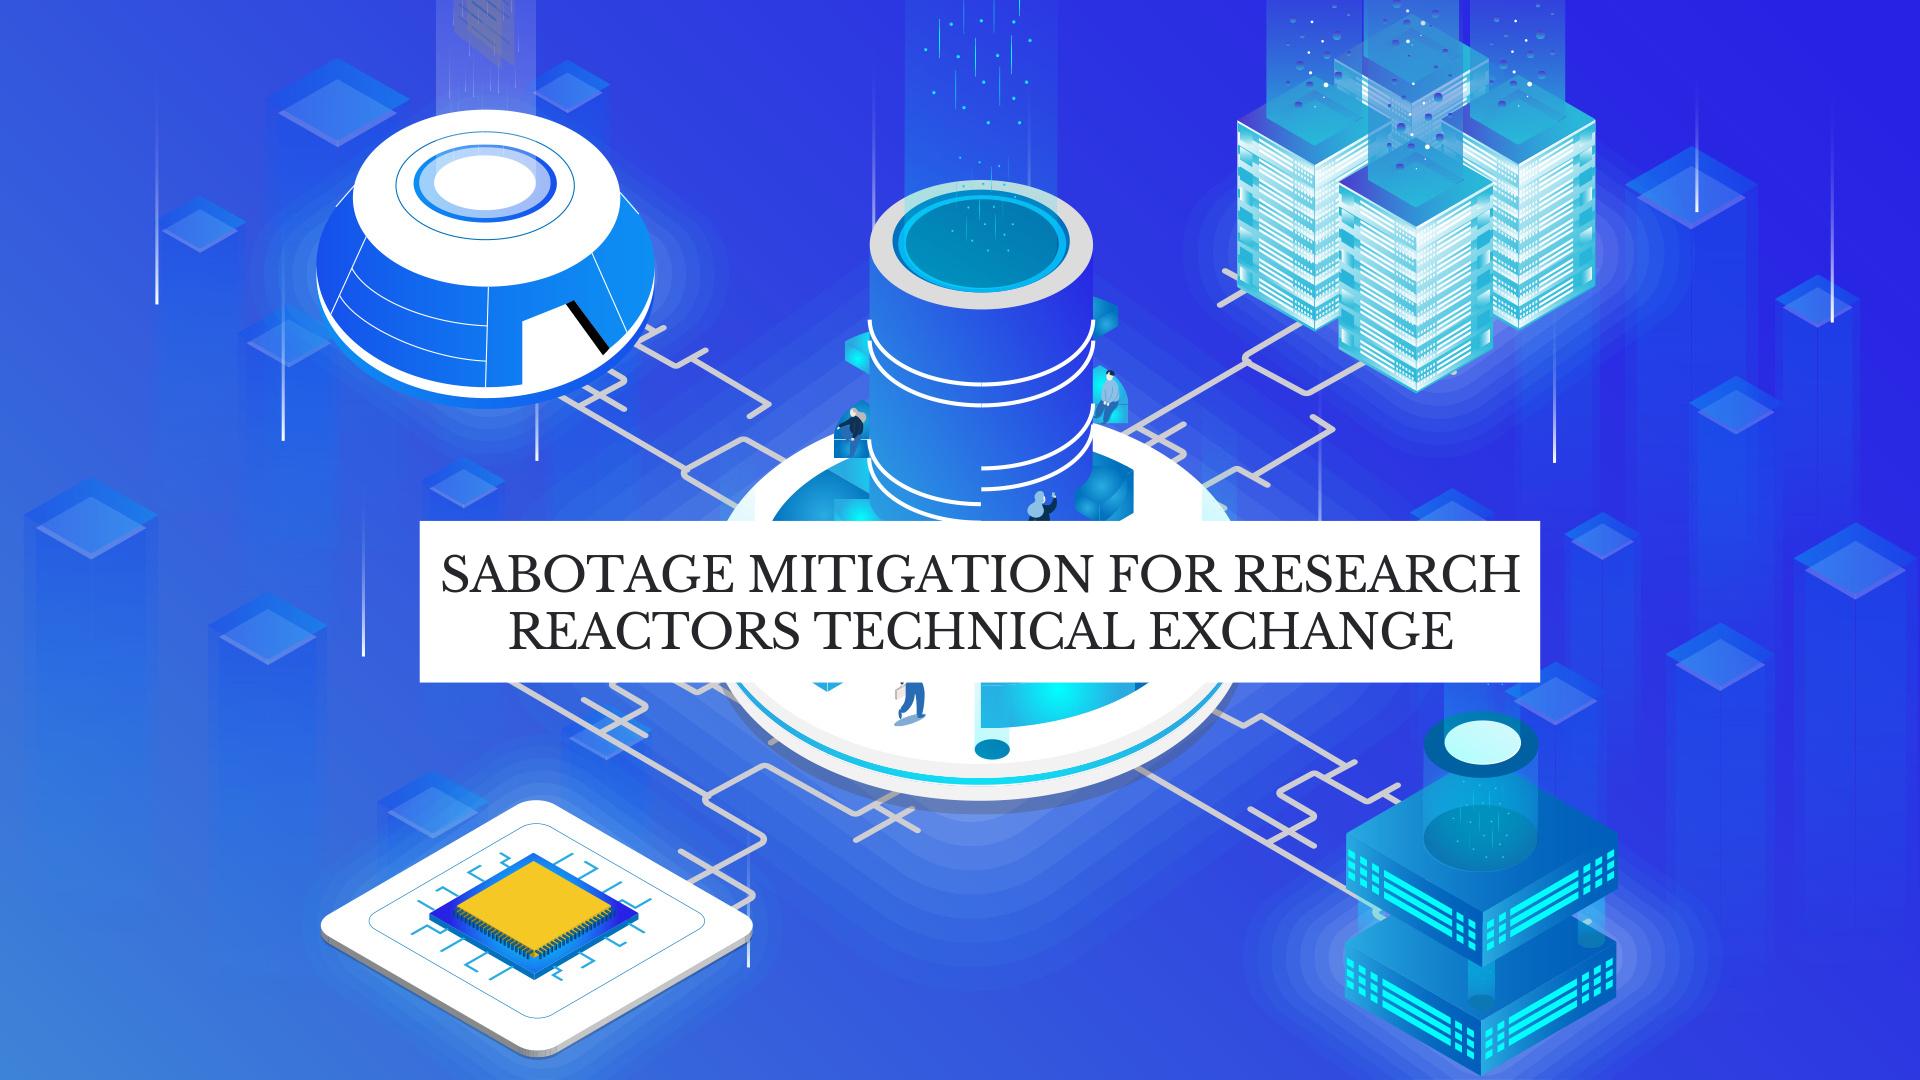 Sabotage Mitigation for Research Reactors